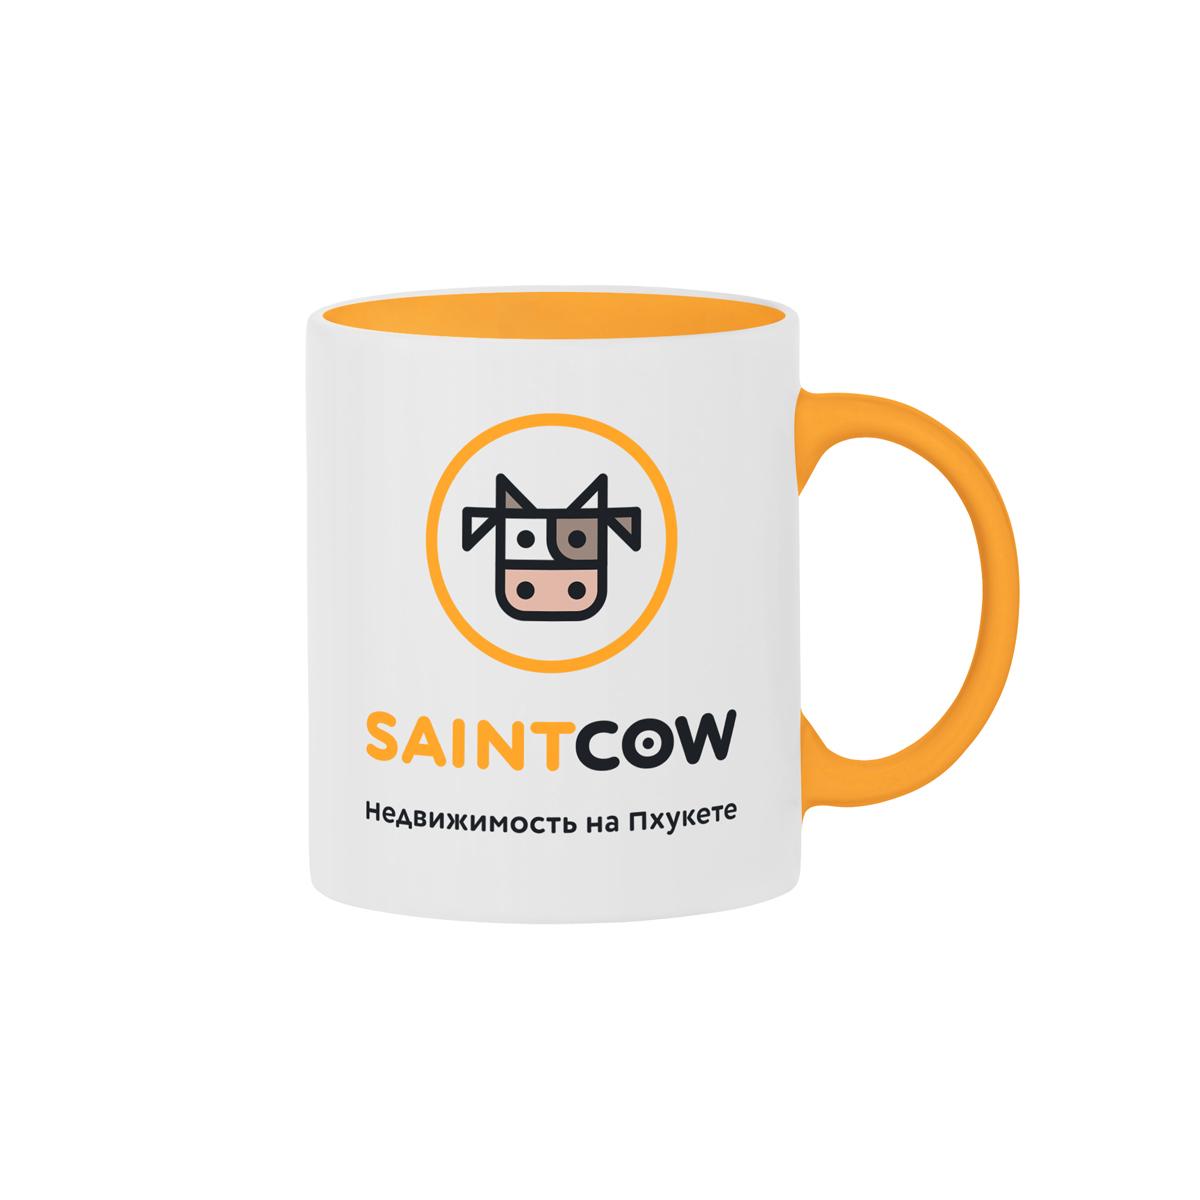 Фирменный стиль для компании Saint Cow фото f_40959bb1054c07ba.jpg